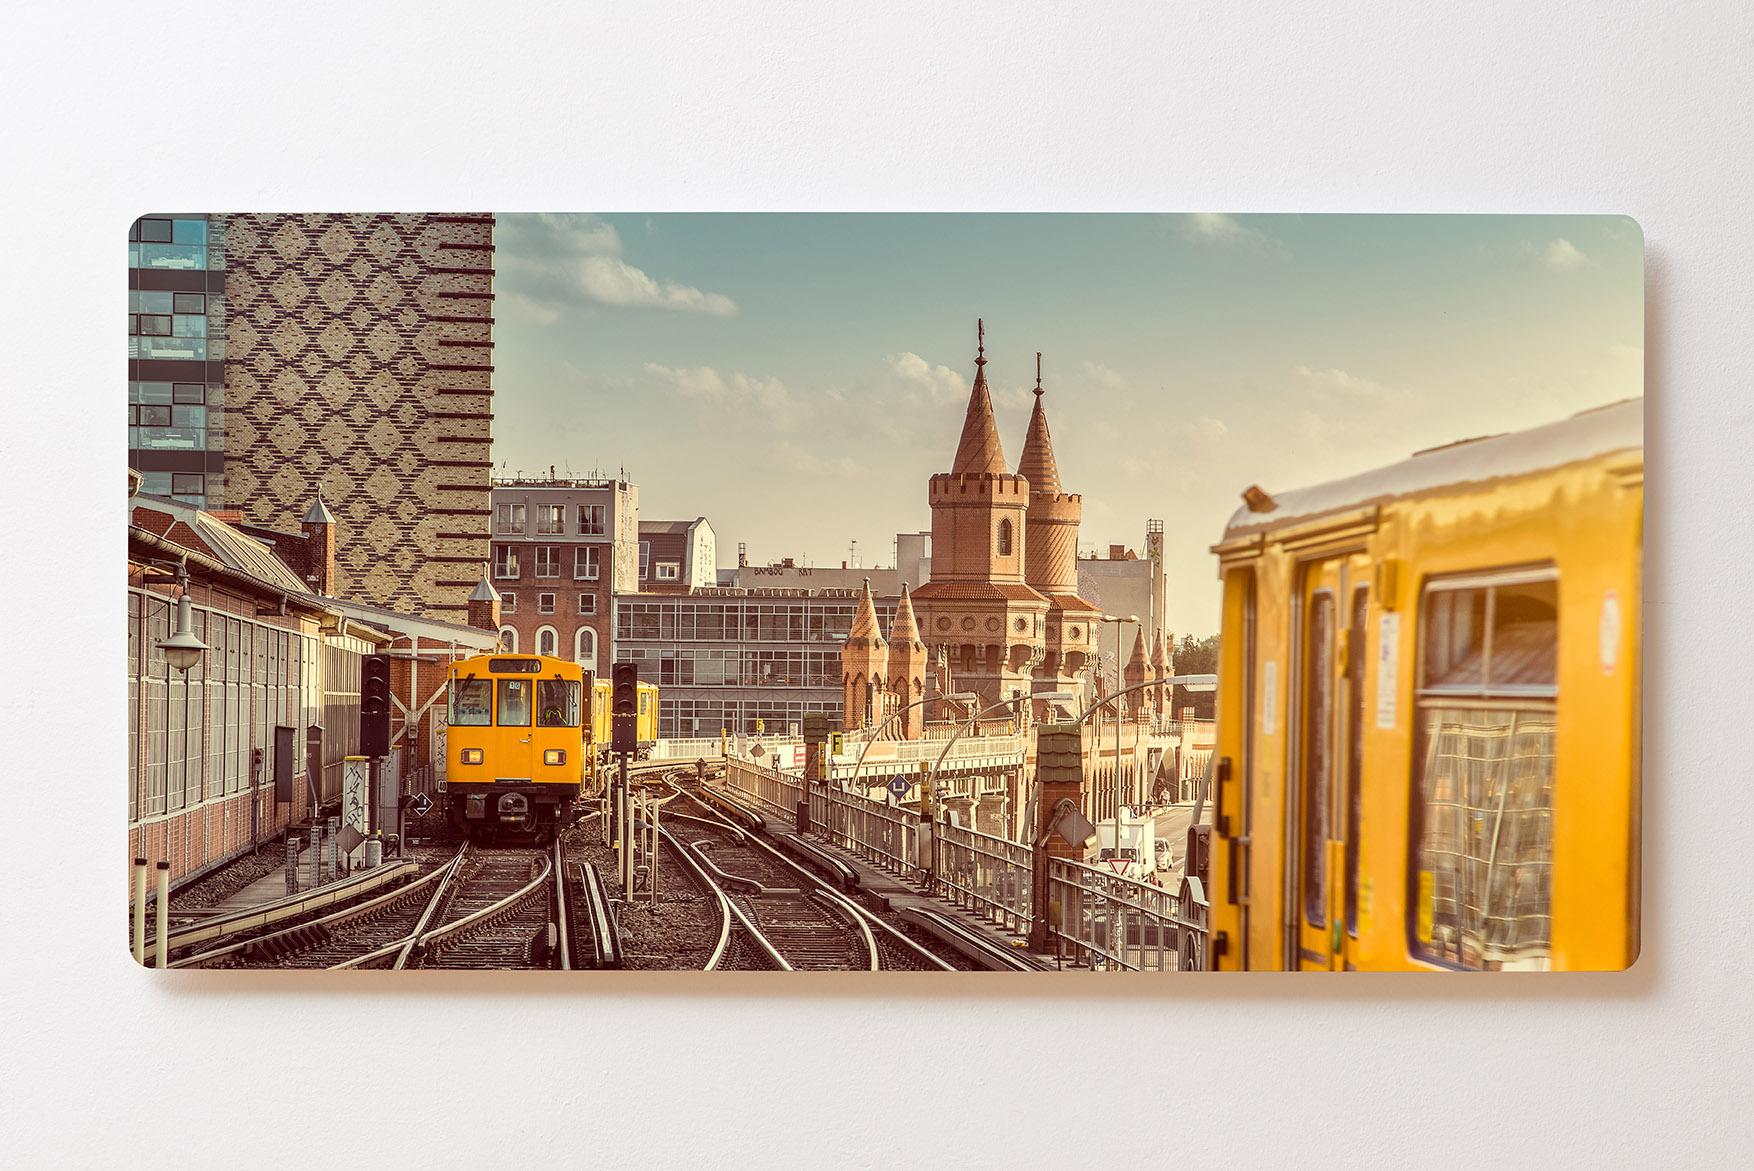 Magnettafel BACKLIGHT 120x60cm Motiv-Wandbild M141 U-Bahn Berlin